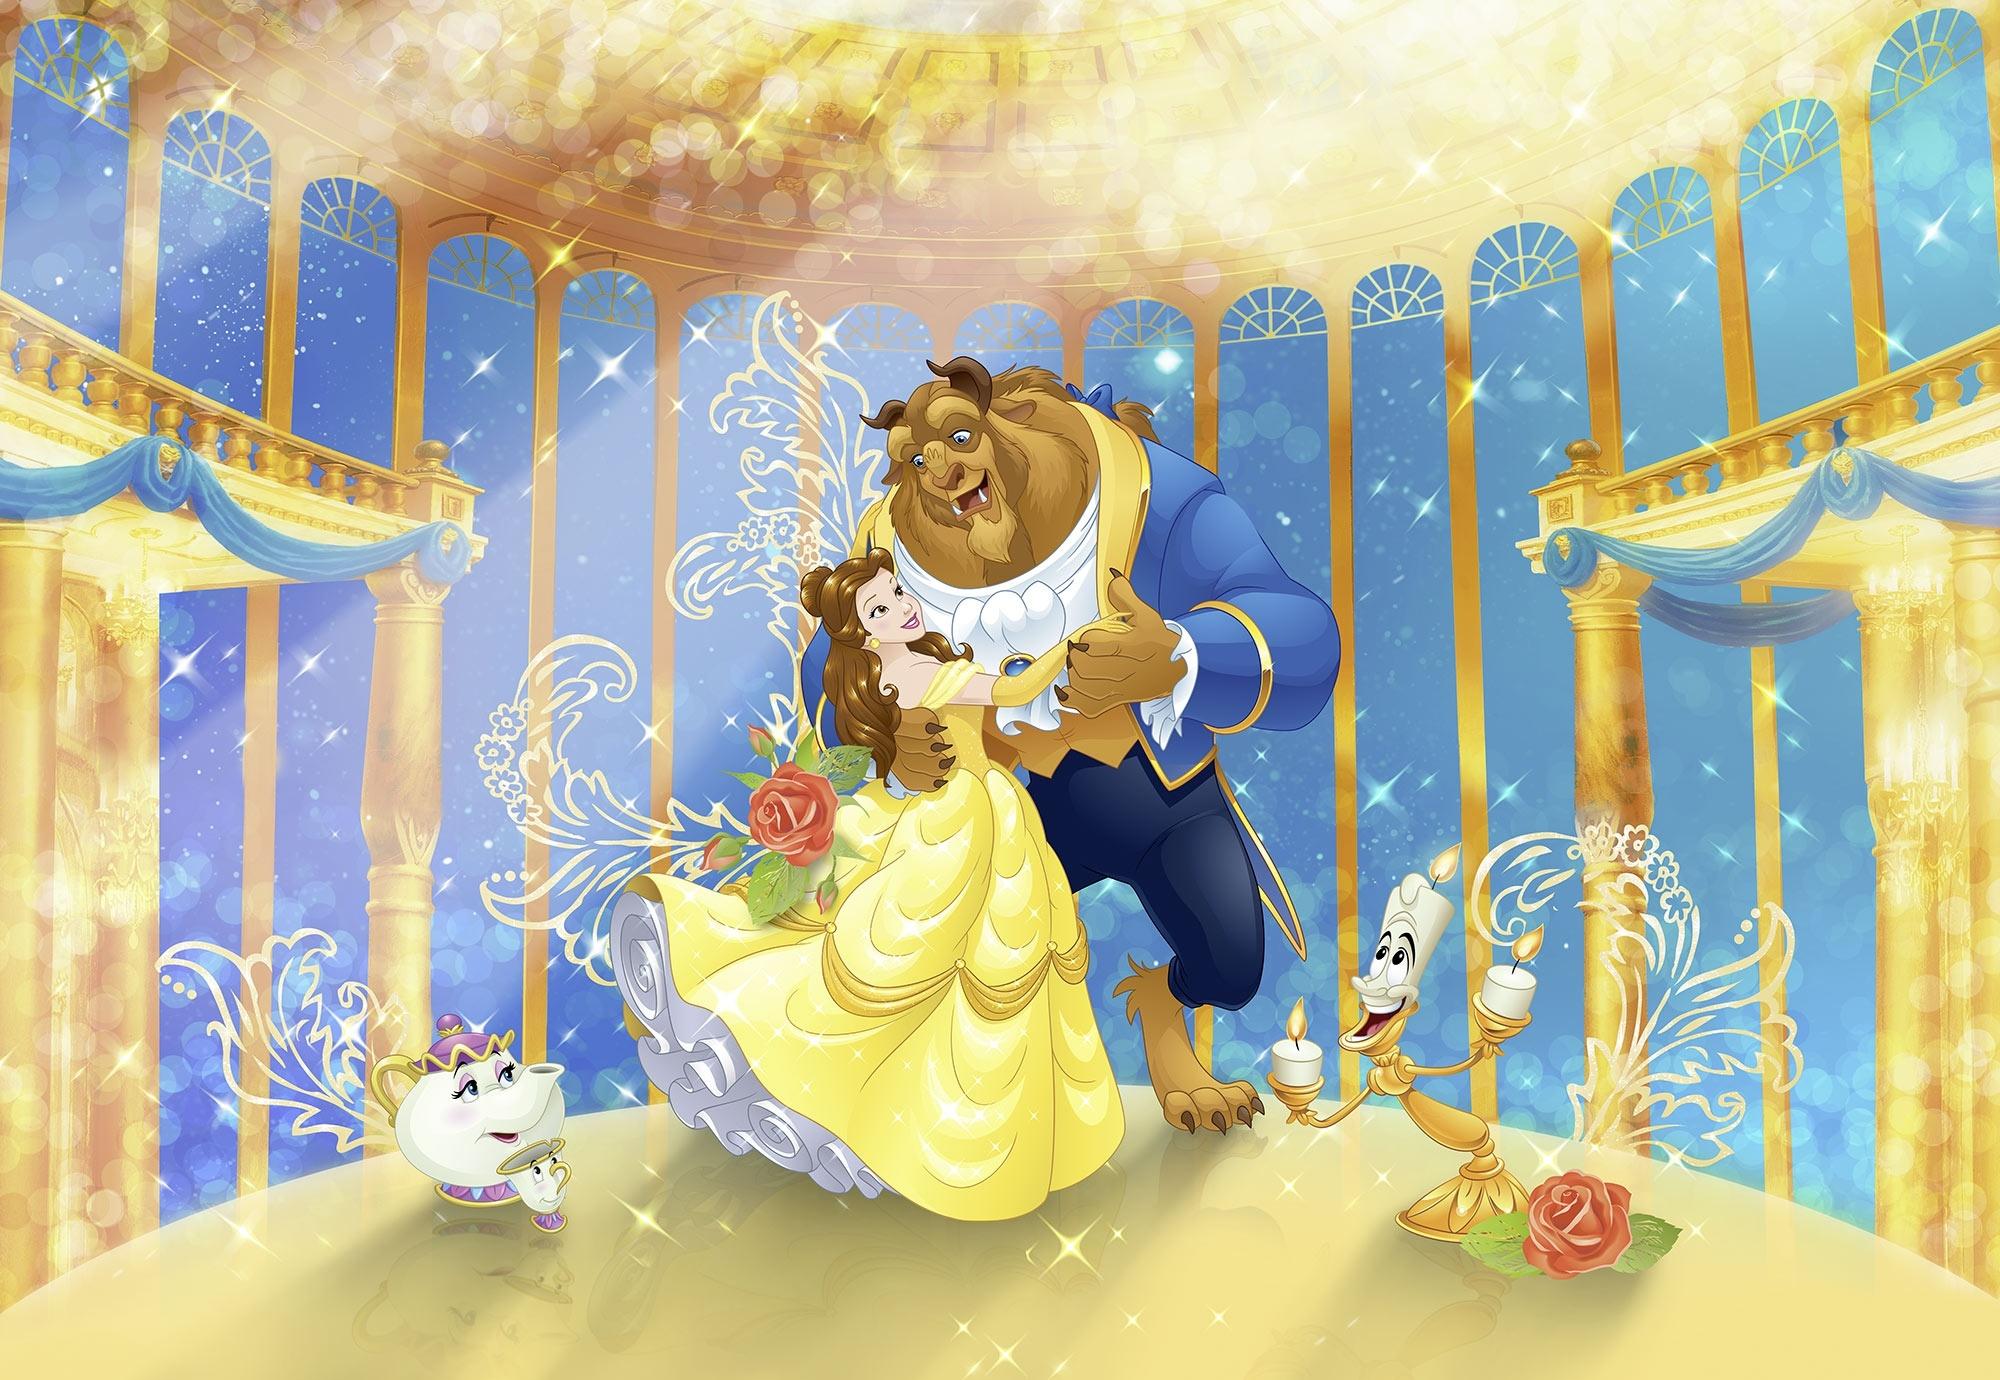 Disney Edition 4 Kinderbehang Komar - Kinderkamer behang BEAUTY AND THE BEAST